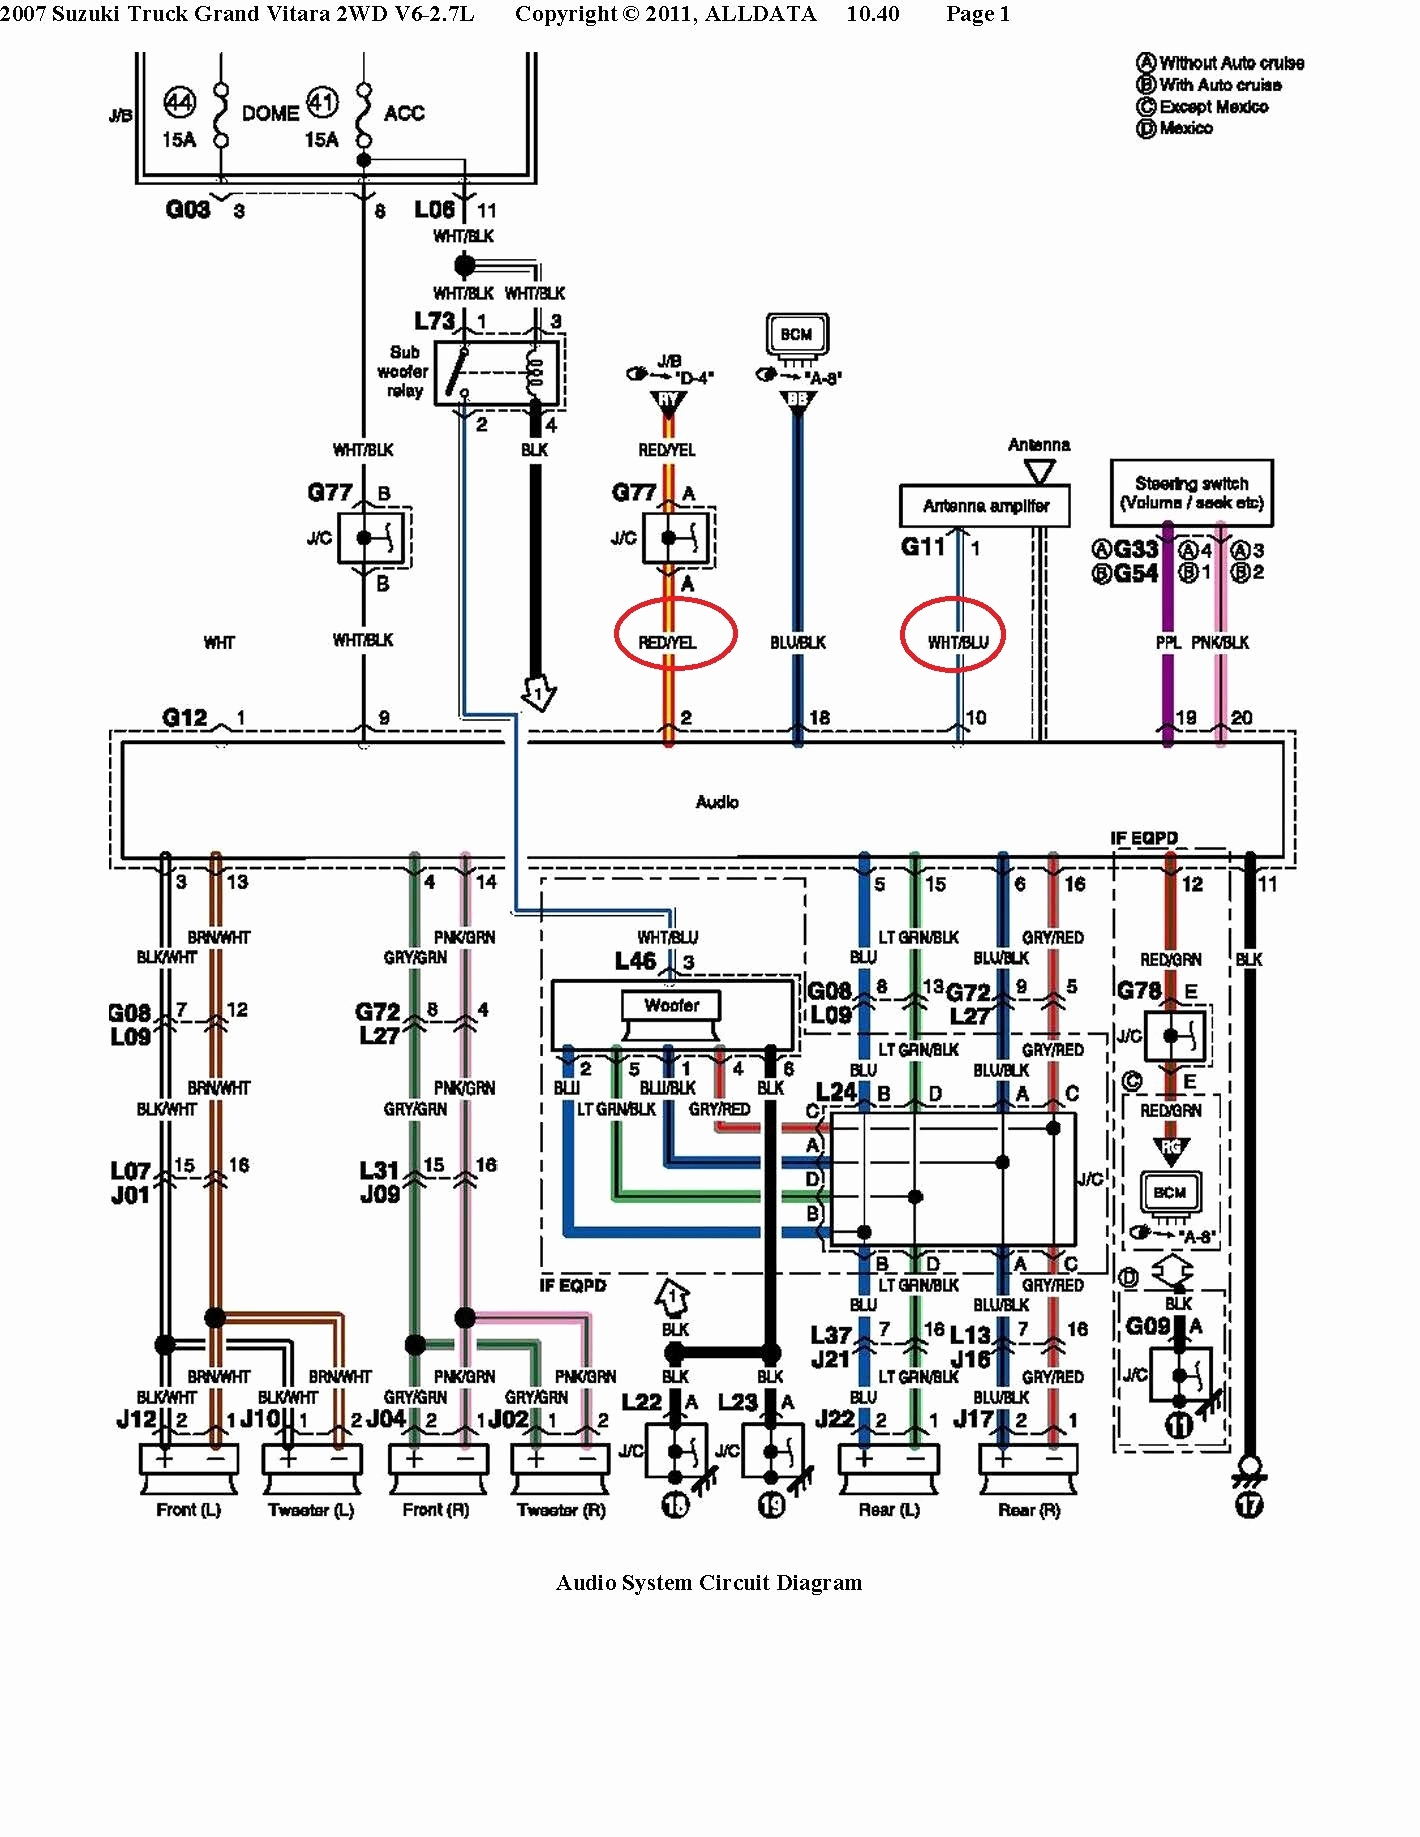 Jbl Amplifier Wiring Diagram | Wiring Diagram - Toyota Jbl Amplifier Wiring Diagram